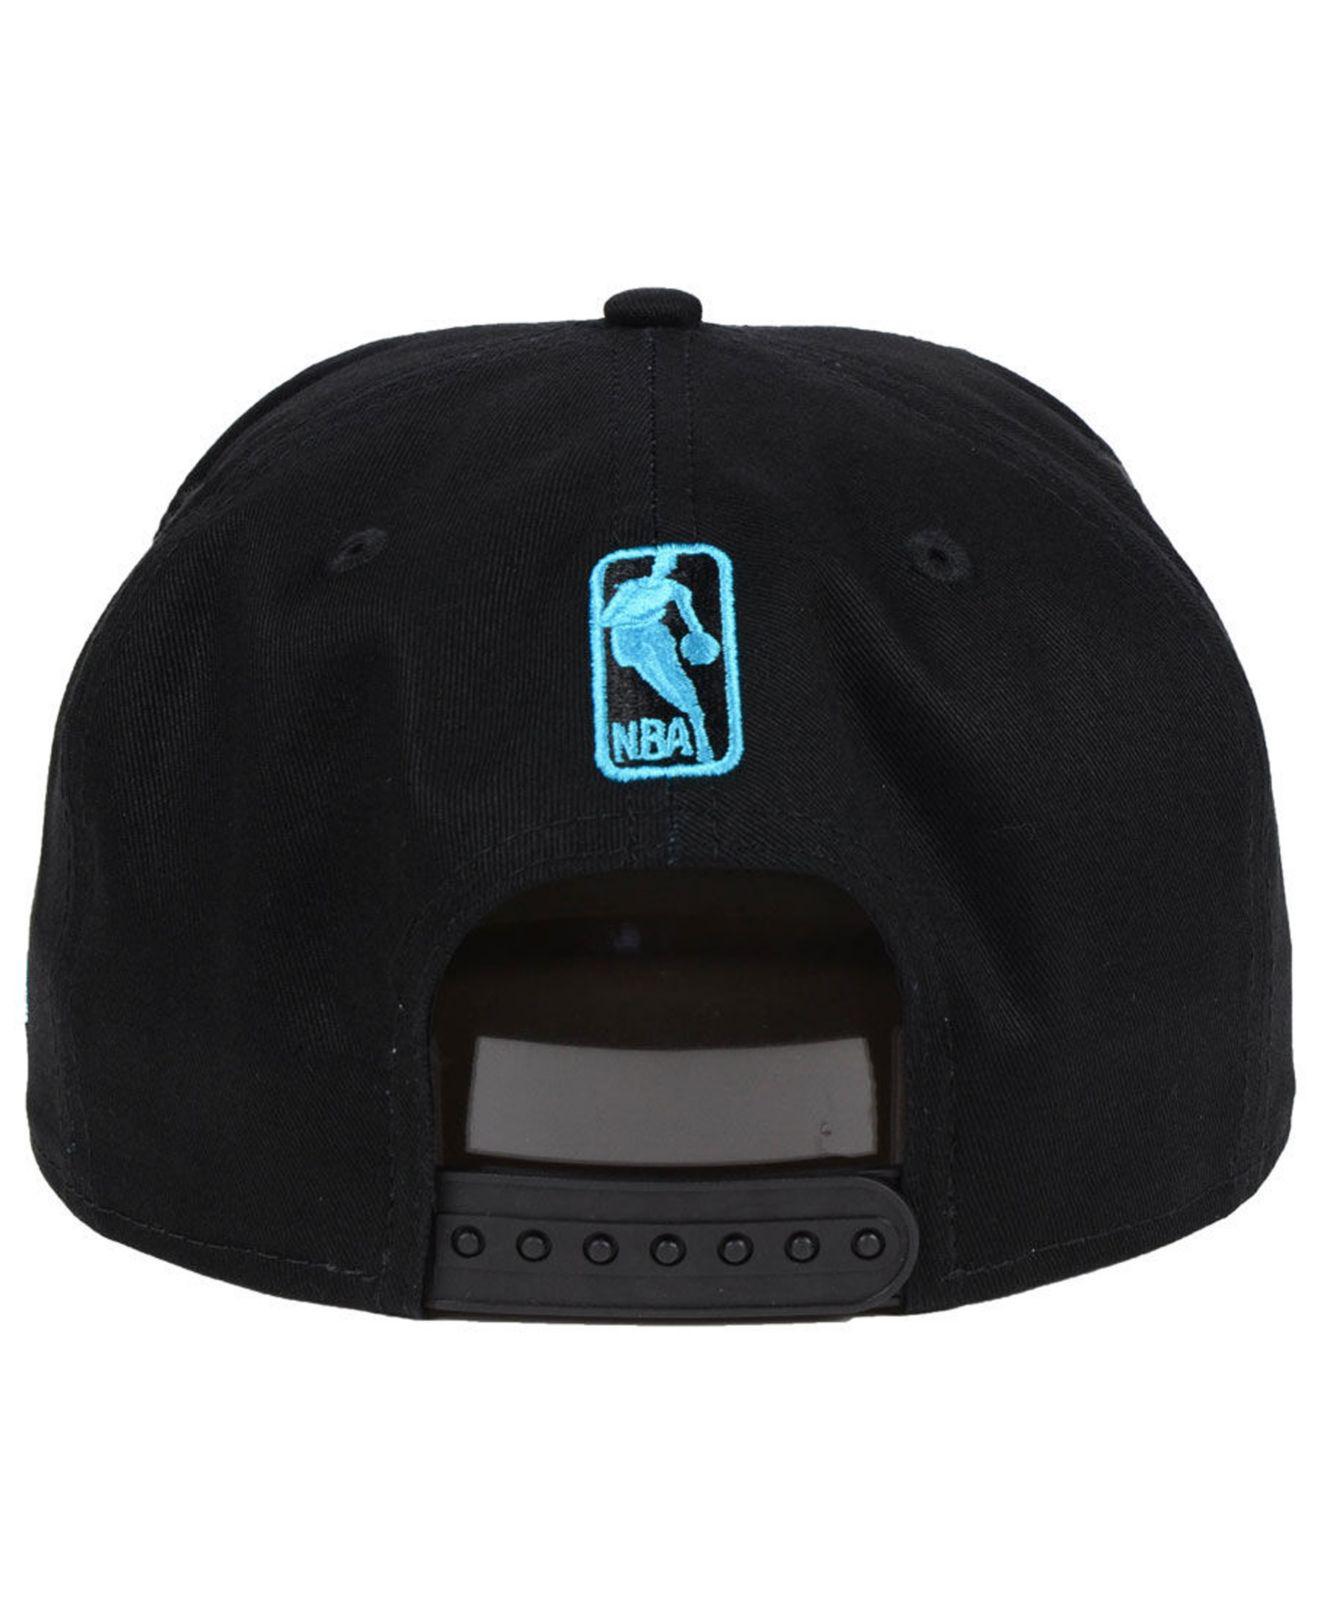 cheap for discount 1517e 86333 ... ebay lyst ktz charlotte hornets retro arch 9fifty snapback cap in black  27a02 9ac6f